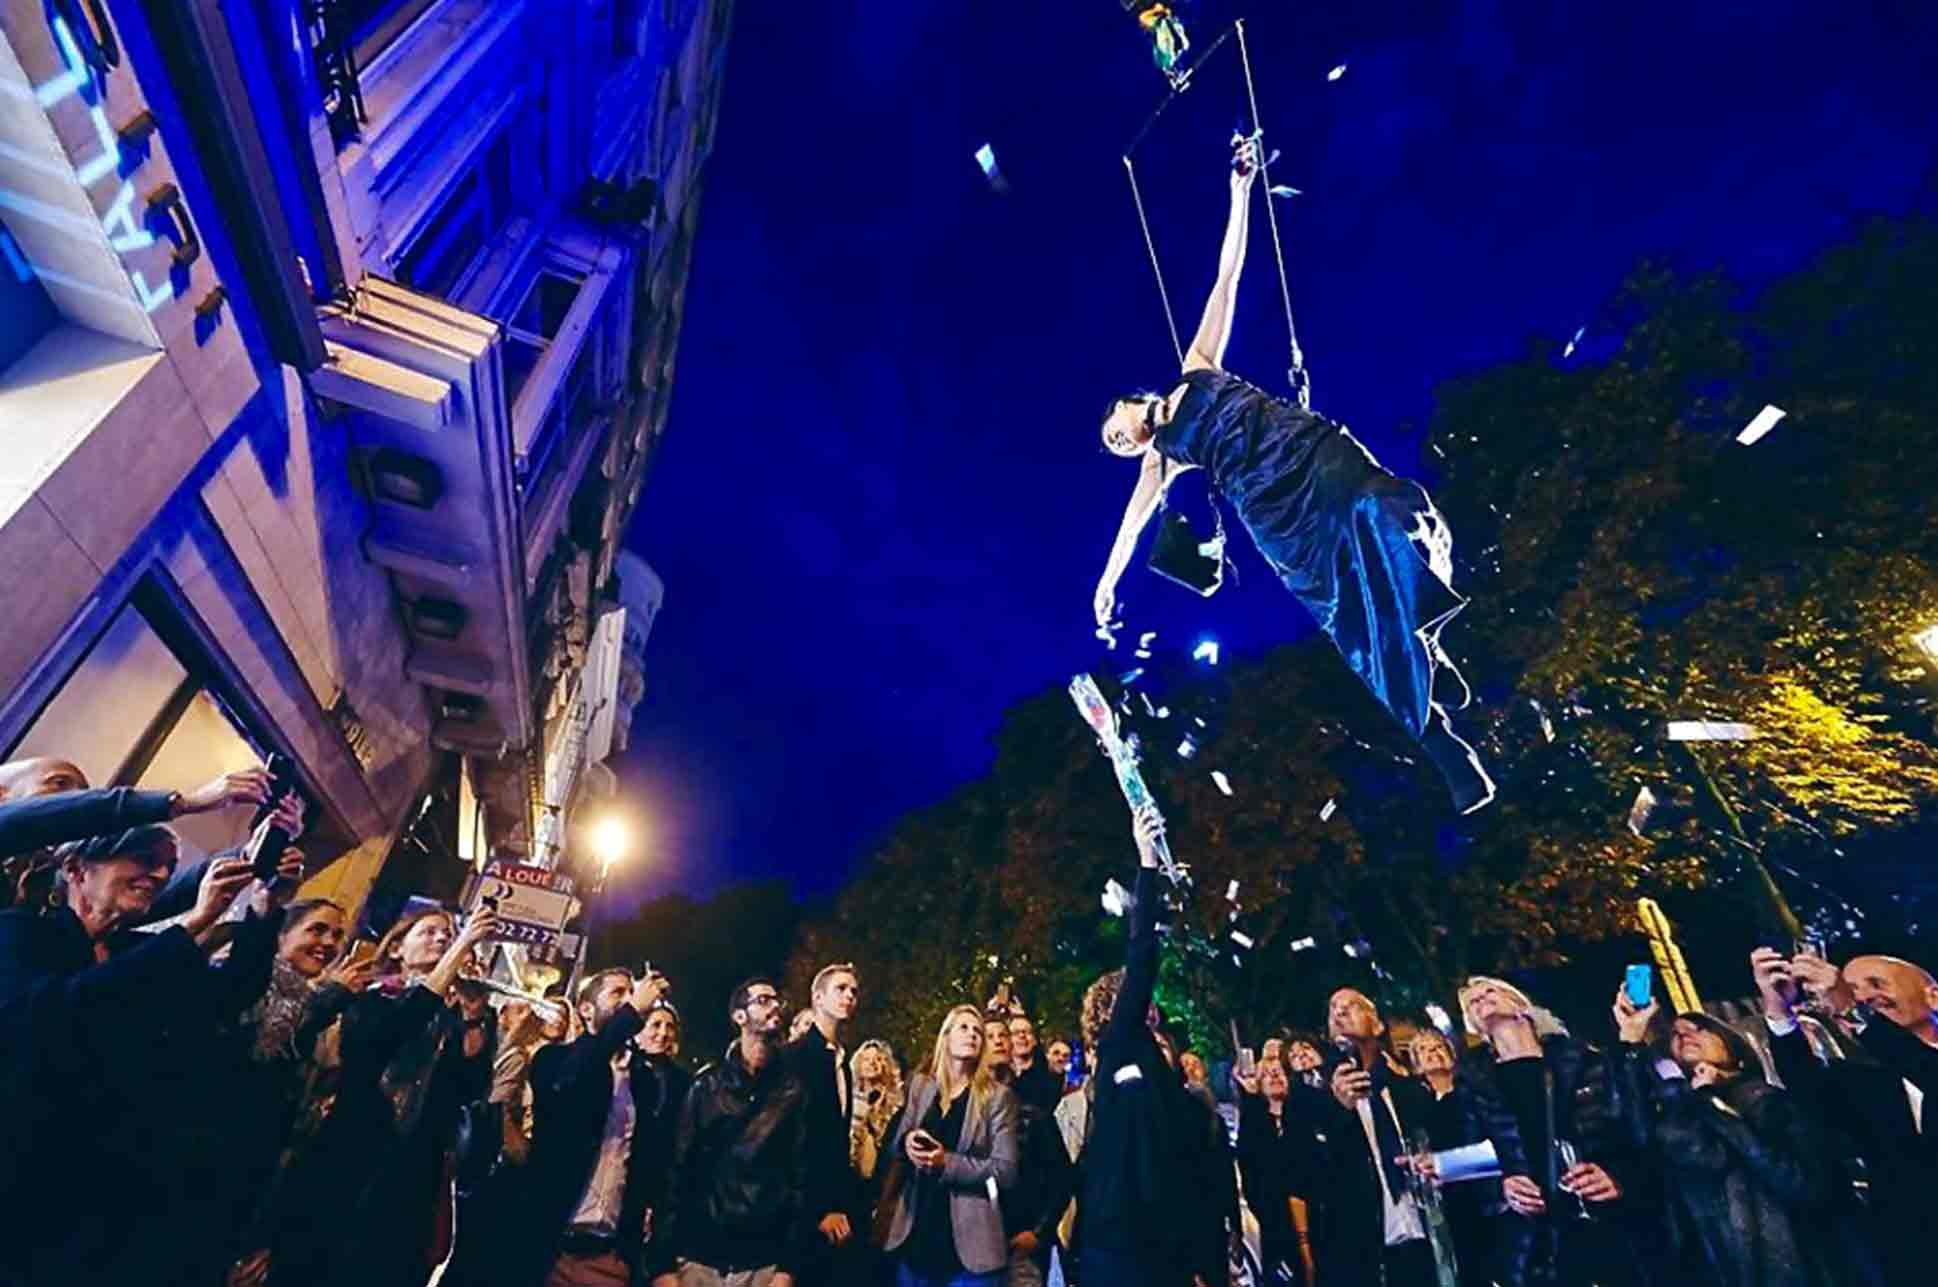 Compagnie_NEWA_luchtacrobatiek_outdoor_performance_crane_confetti